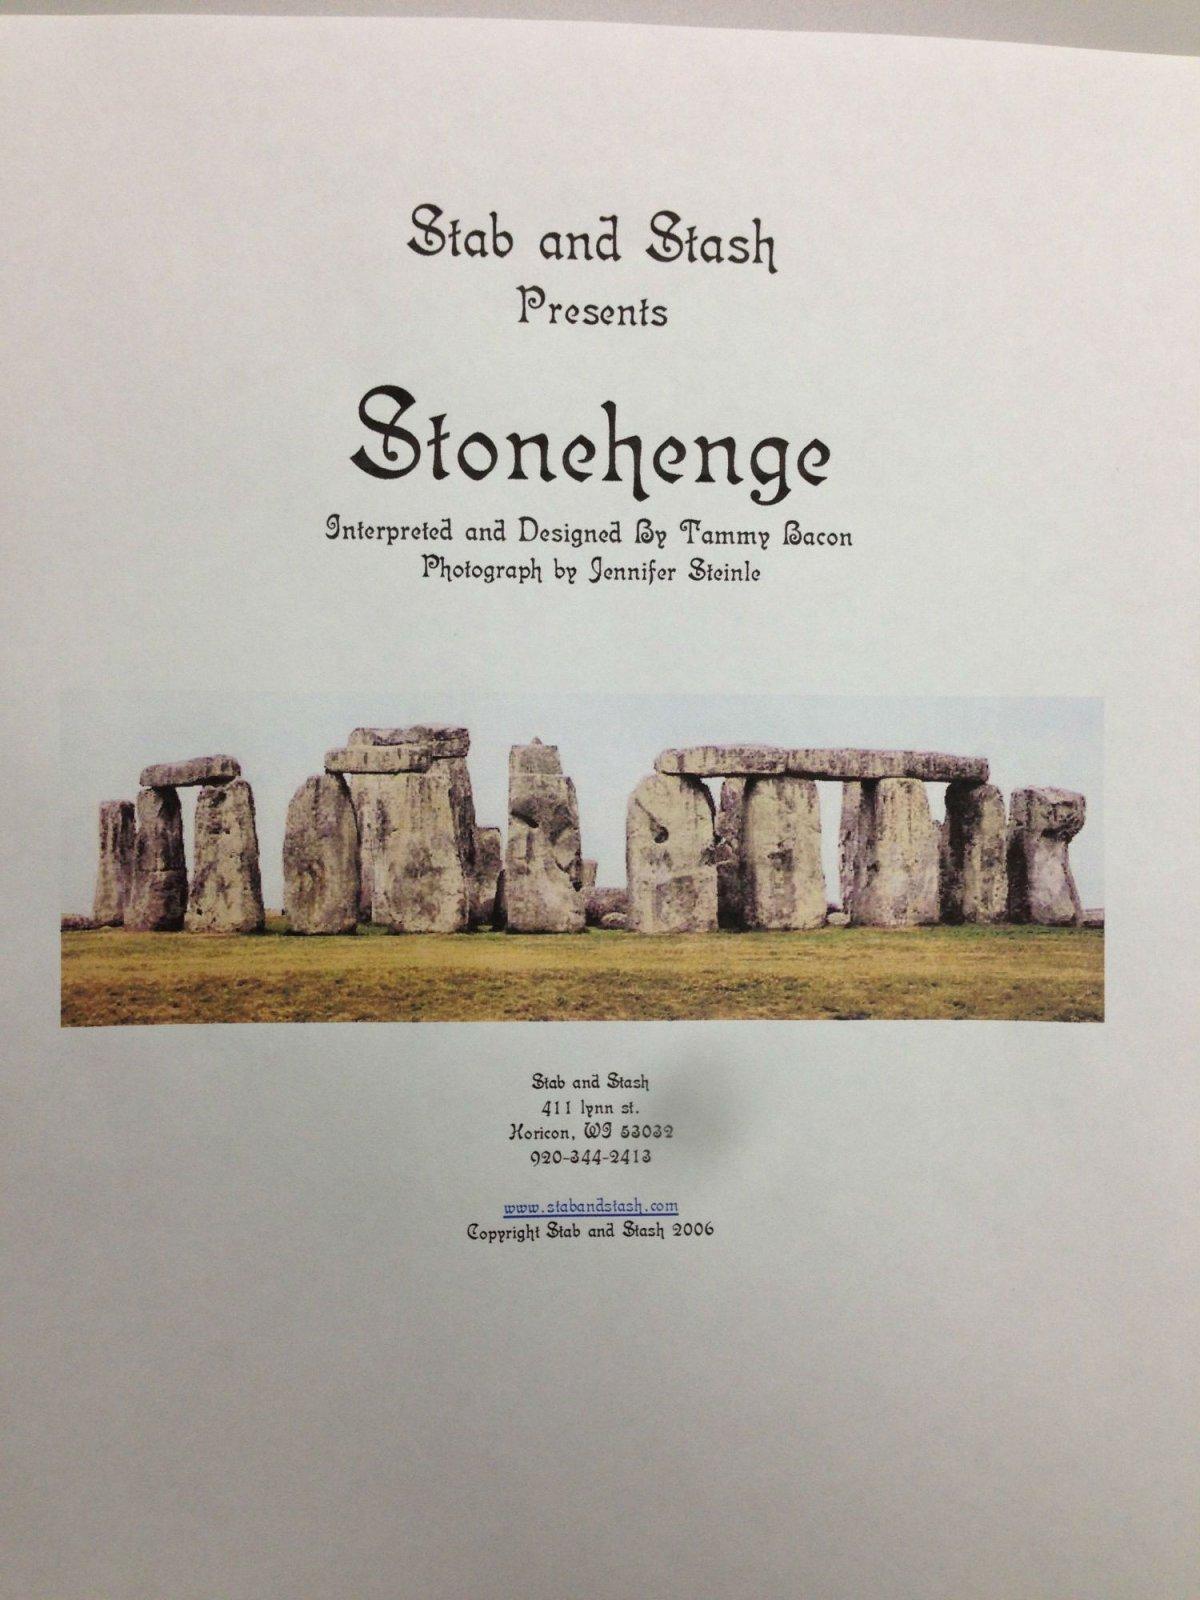 Stab and Stash Stonehenge